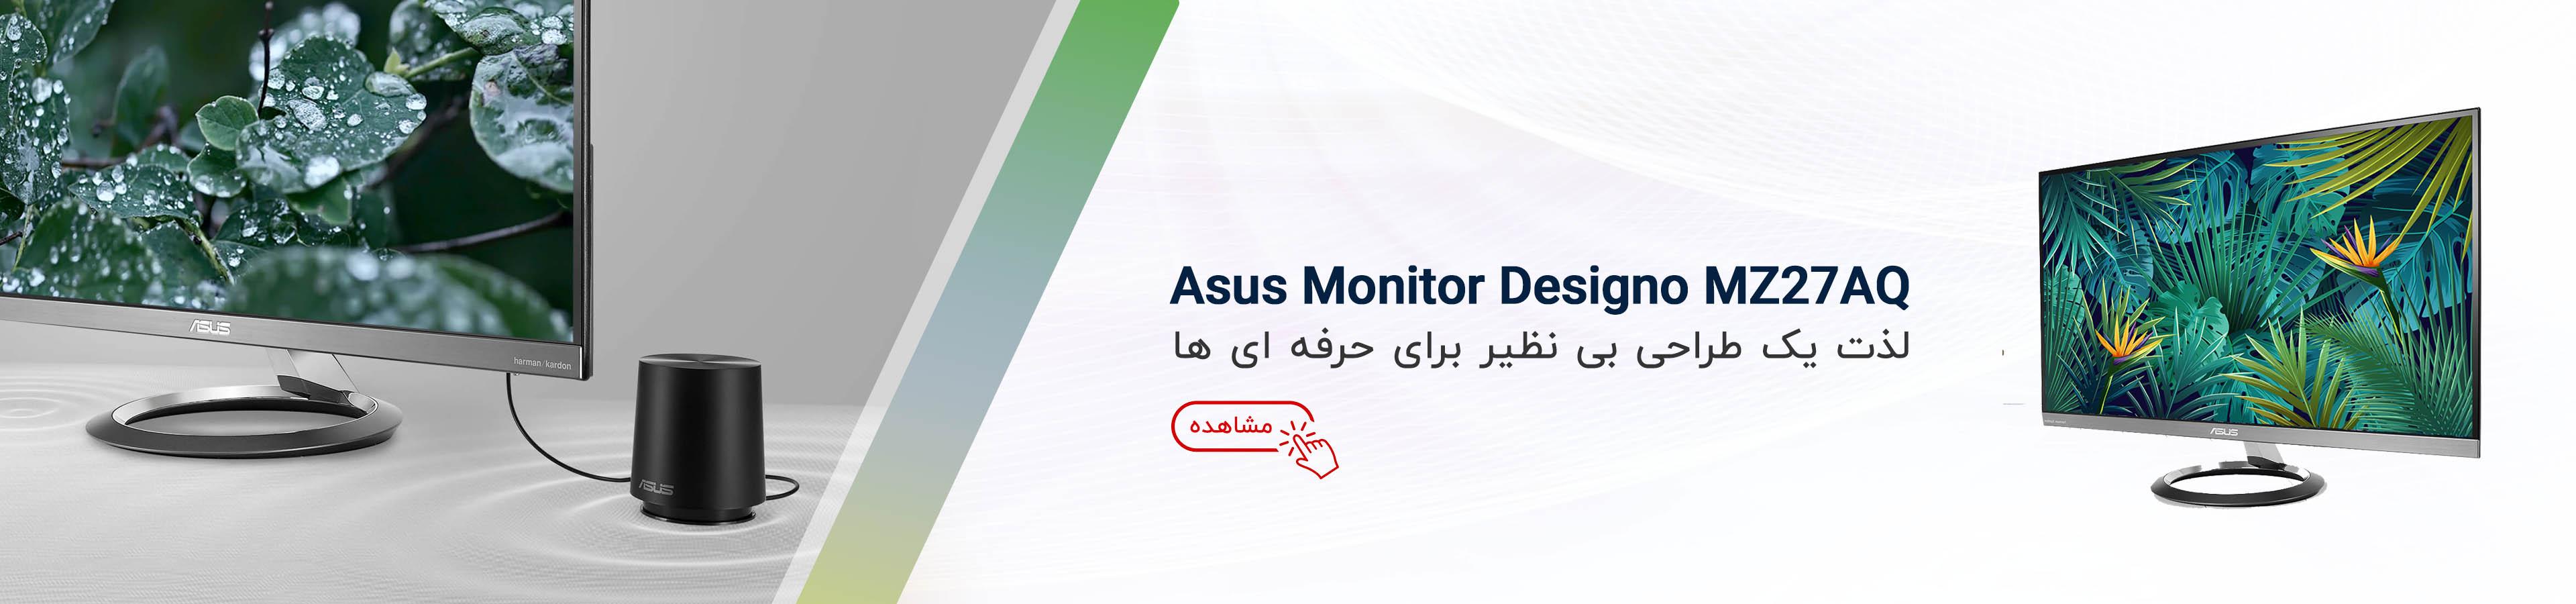 Asus-Monitor-Designo-MZ27AQ